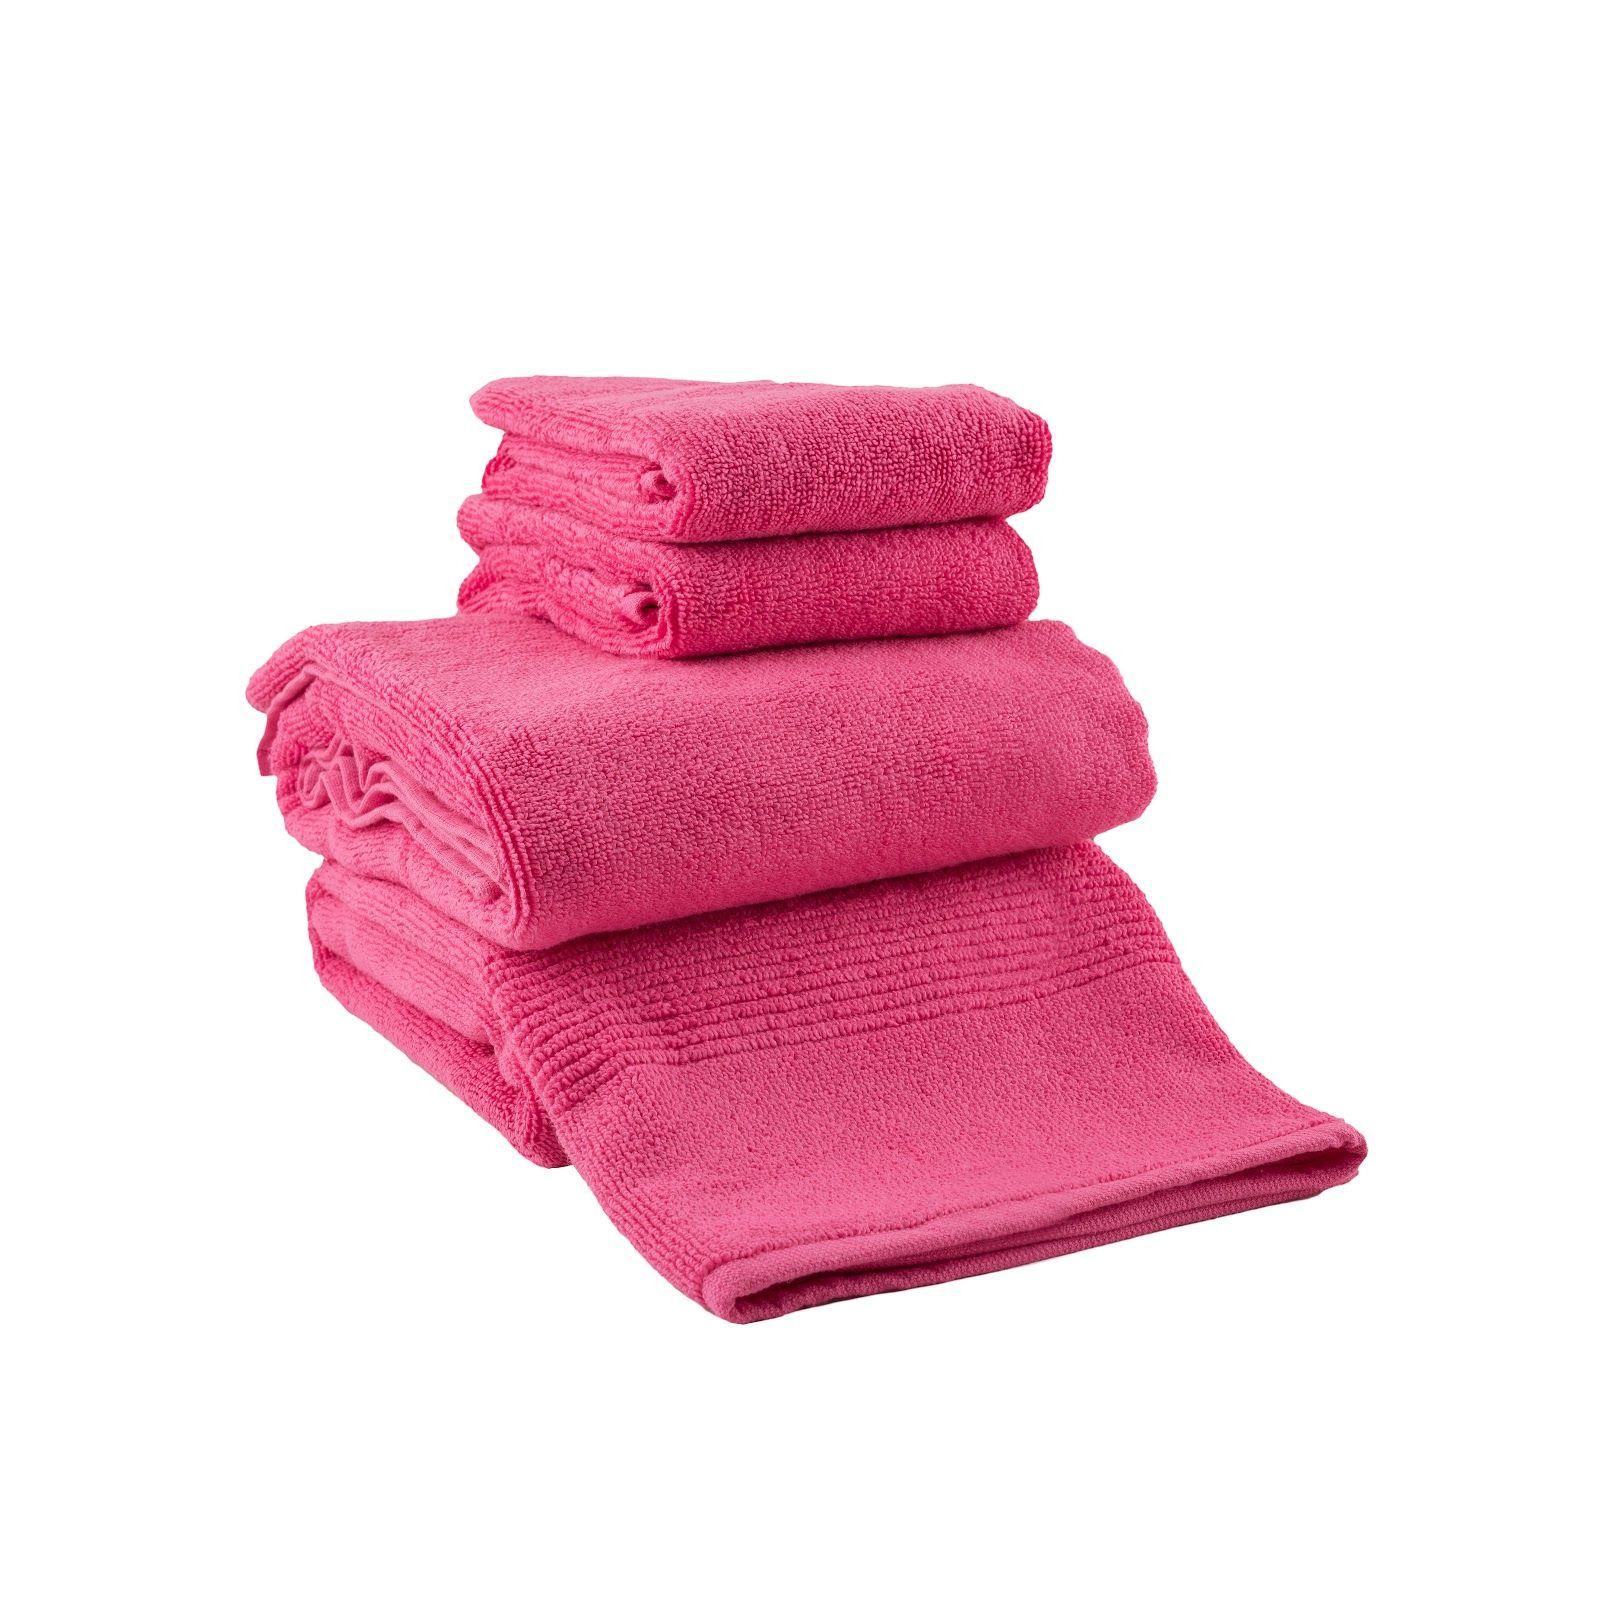 Bathroom Must Haves Bath Linens Pink Towels Linen Shop